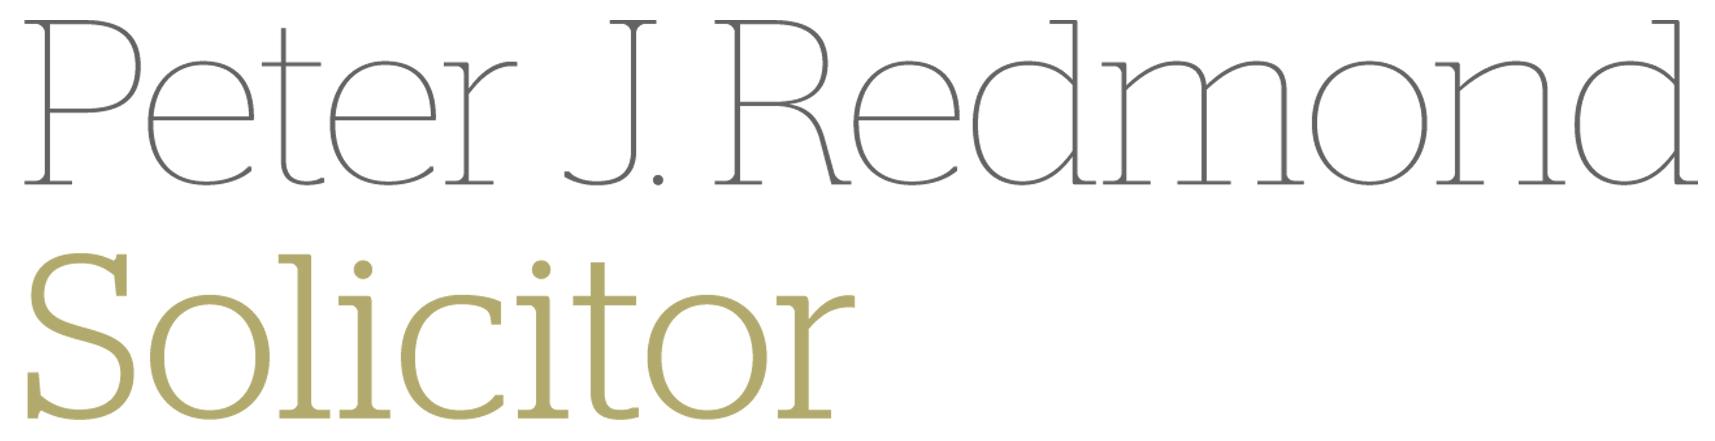 Peter Redmond Solicitor